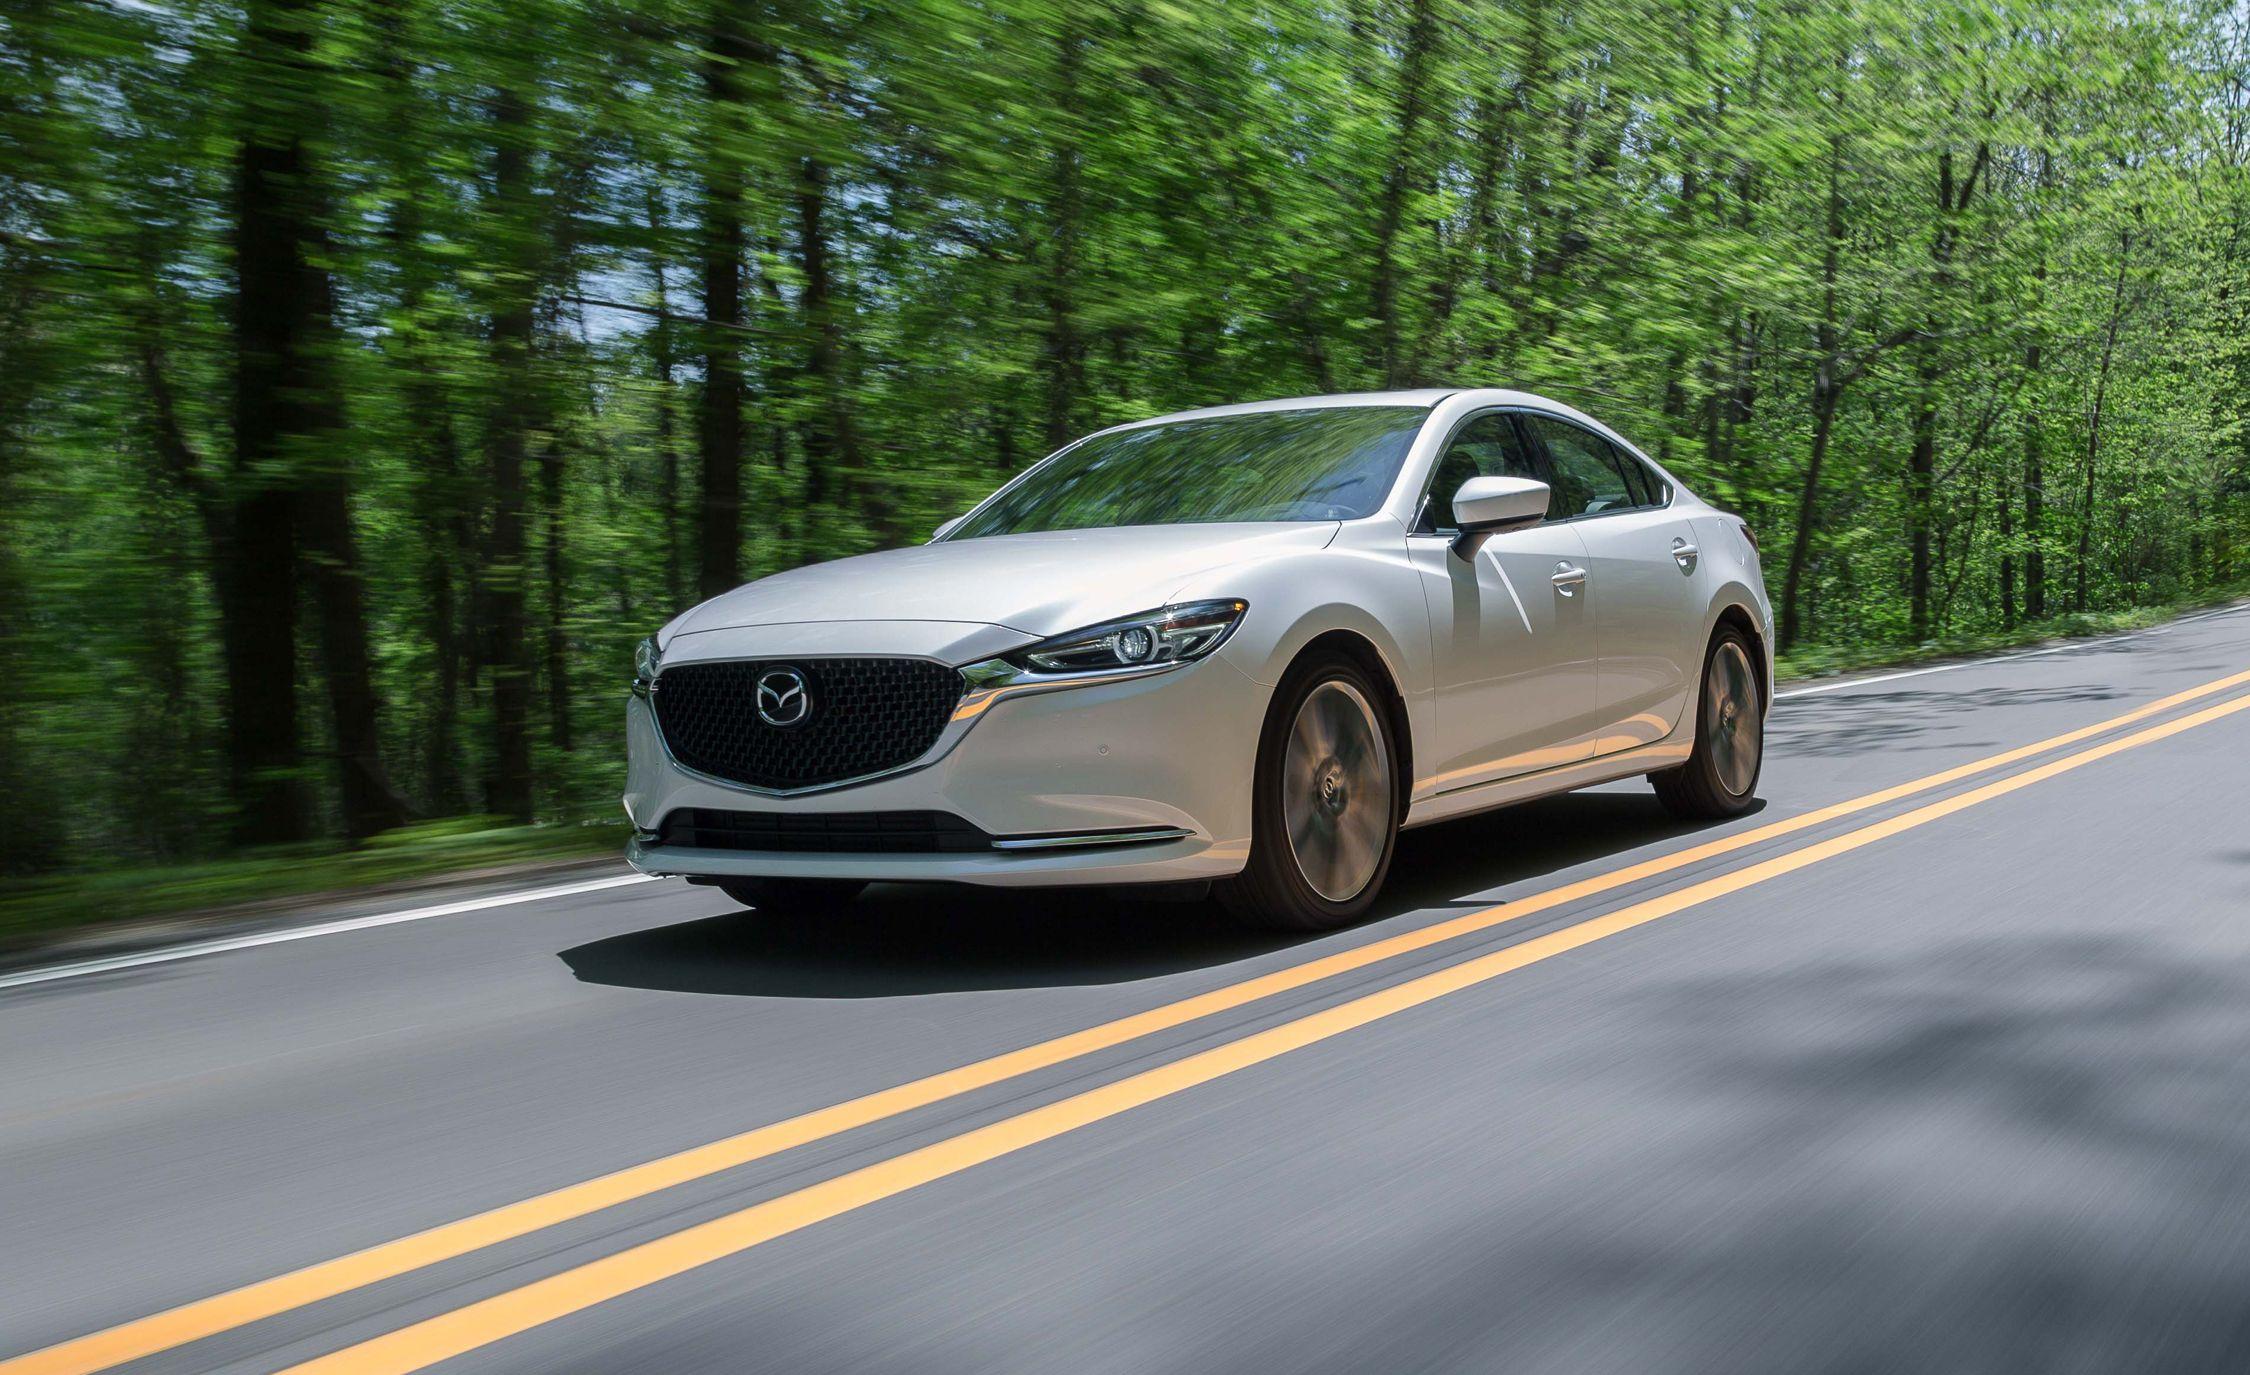 Kelebihan Mazda 6 2.5 Turbo Harga